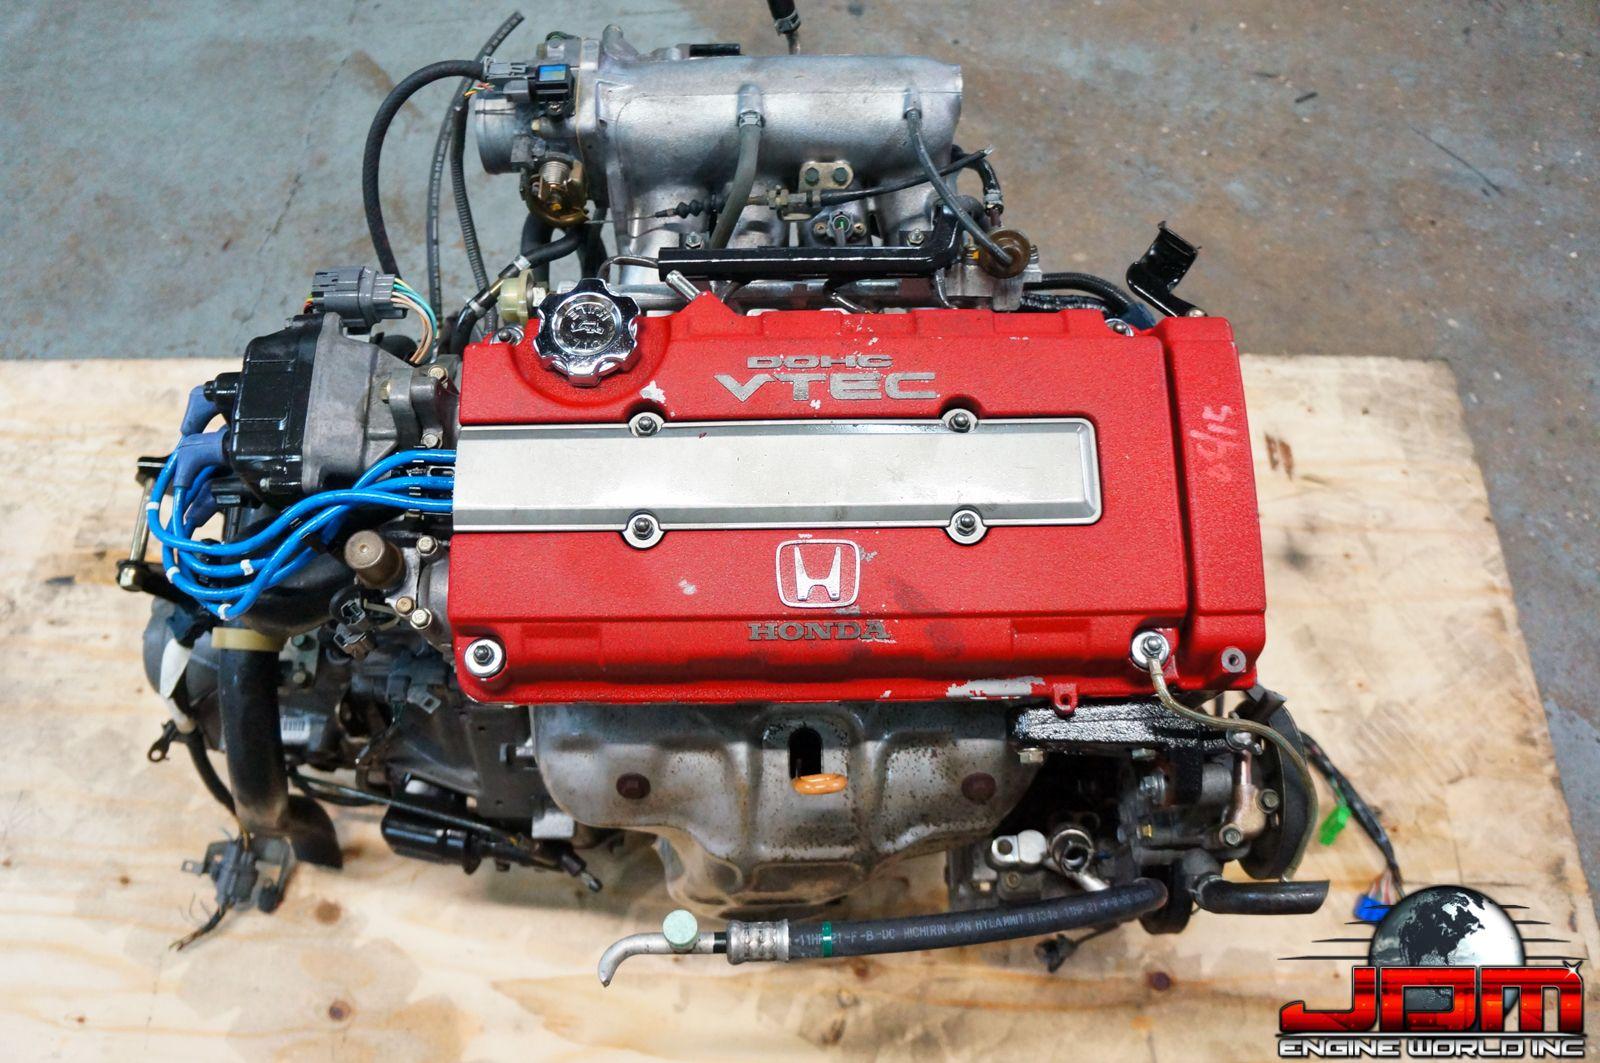 Jdm B16b Type R 99 00 Spec Engine Only Jdm Honda B16b Typer 1 6l Ctr 2 450 00 Jdm Honda Honda Civic Coupe Honda Civic Engine